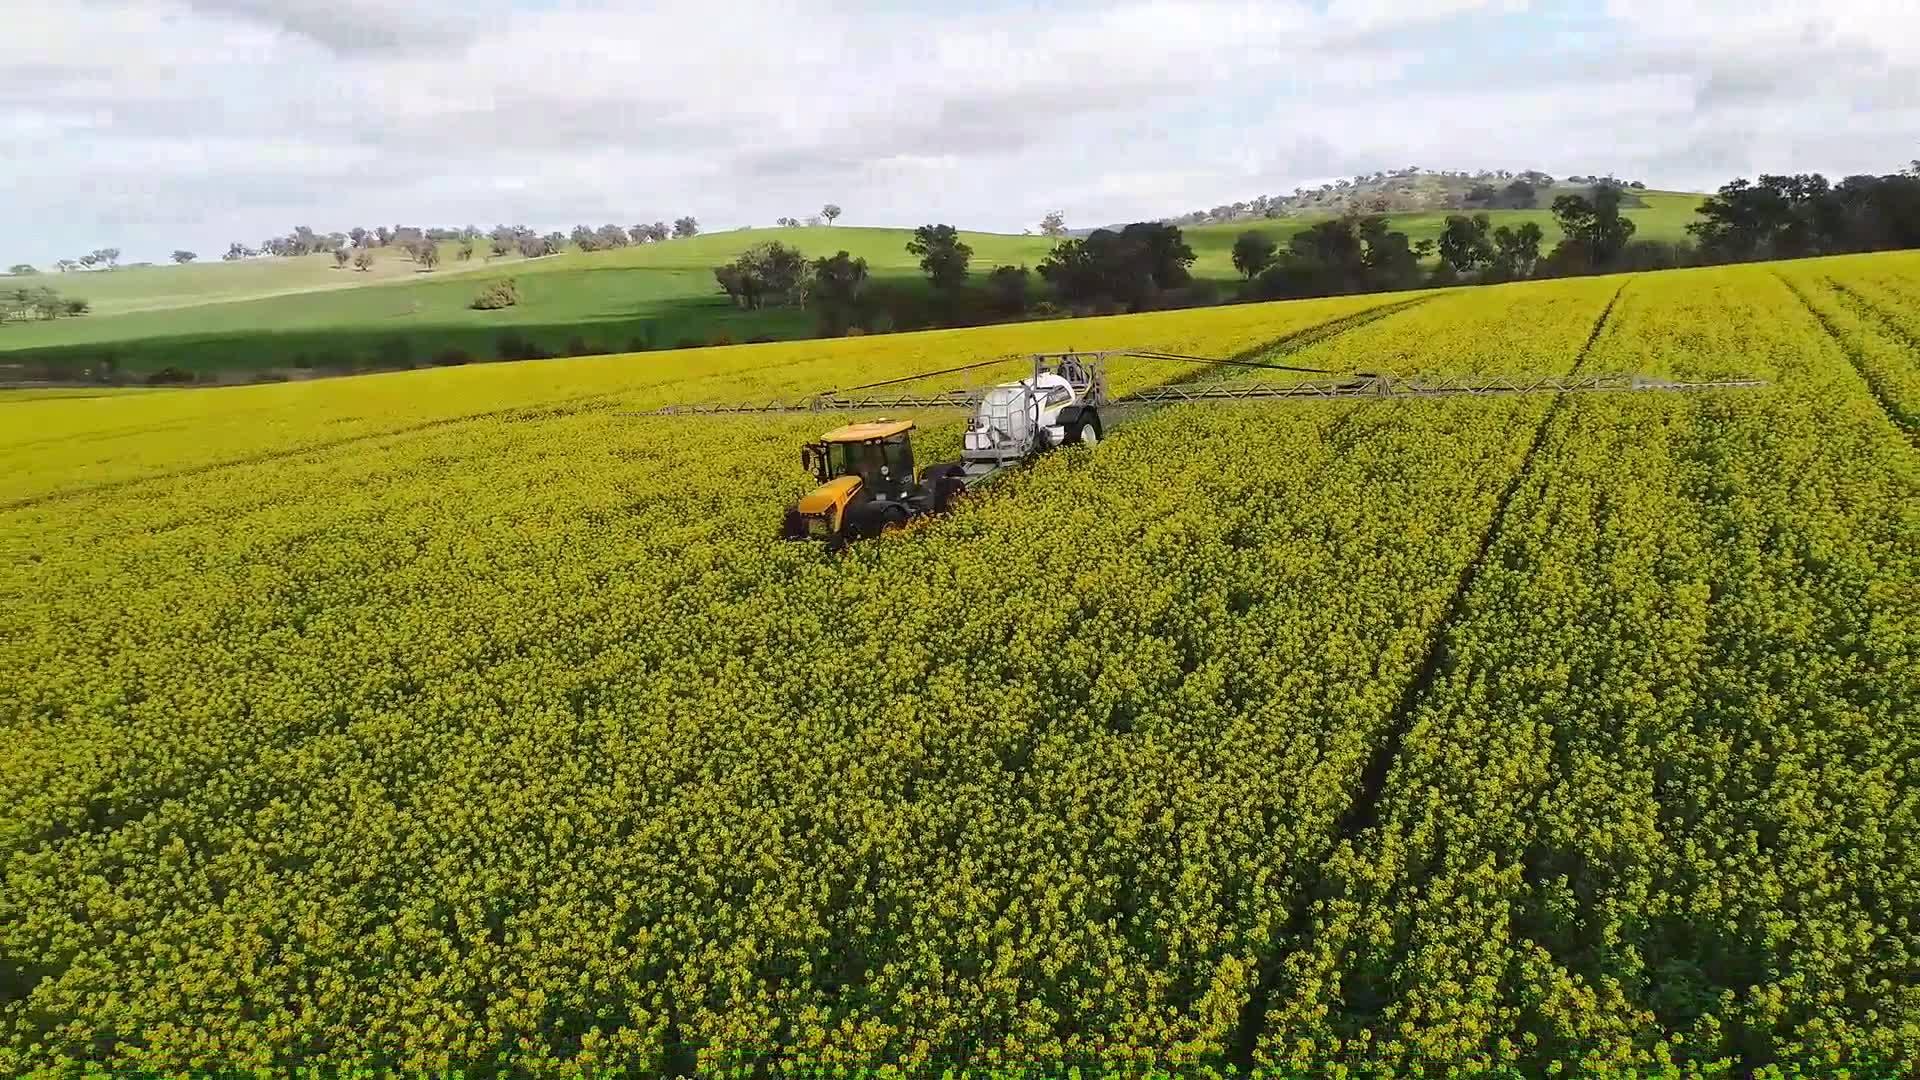 JTA 6000L 36M Spraying Canola Crop